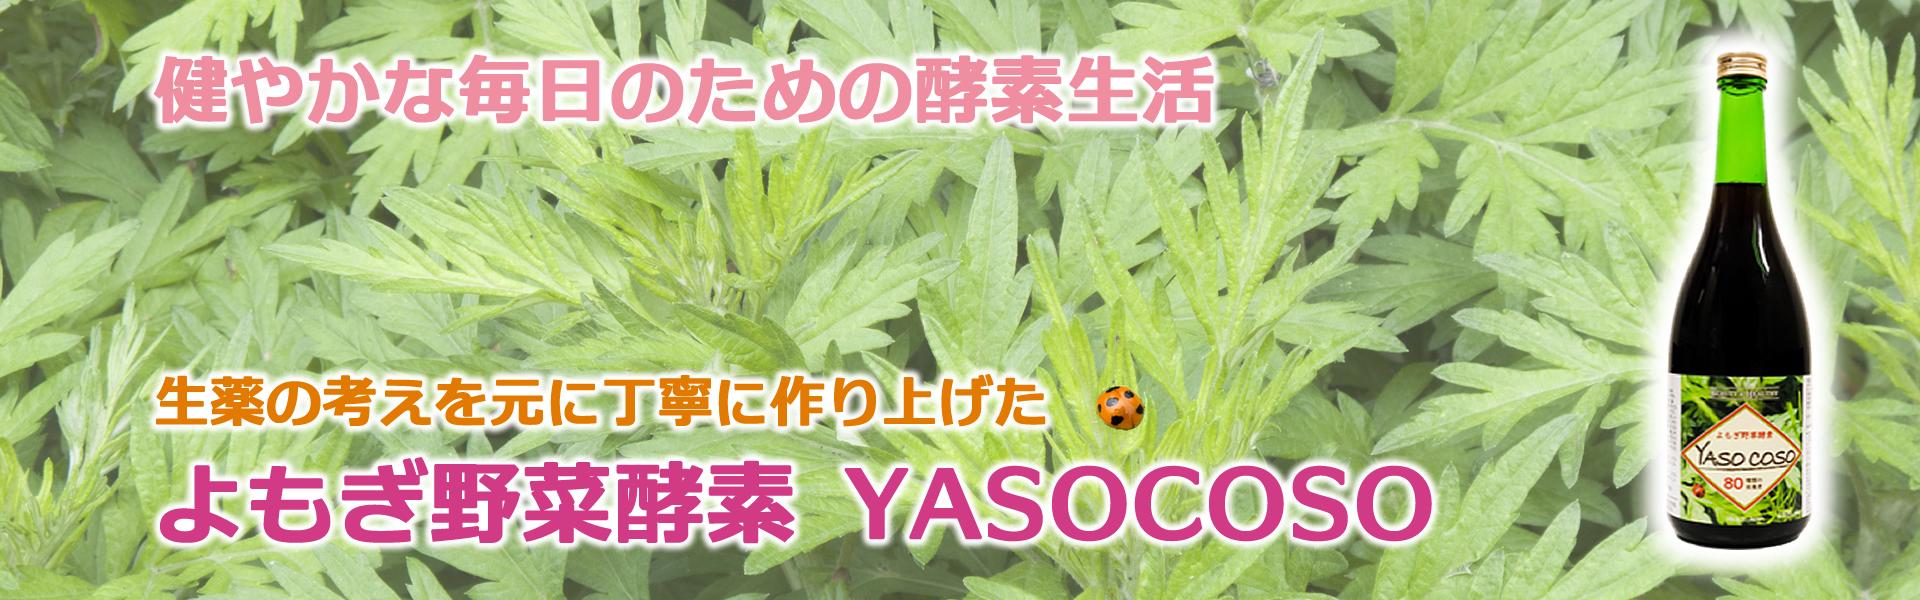 yasocoso-header